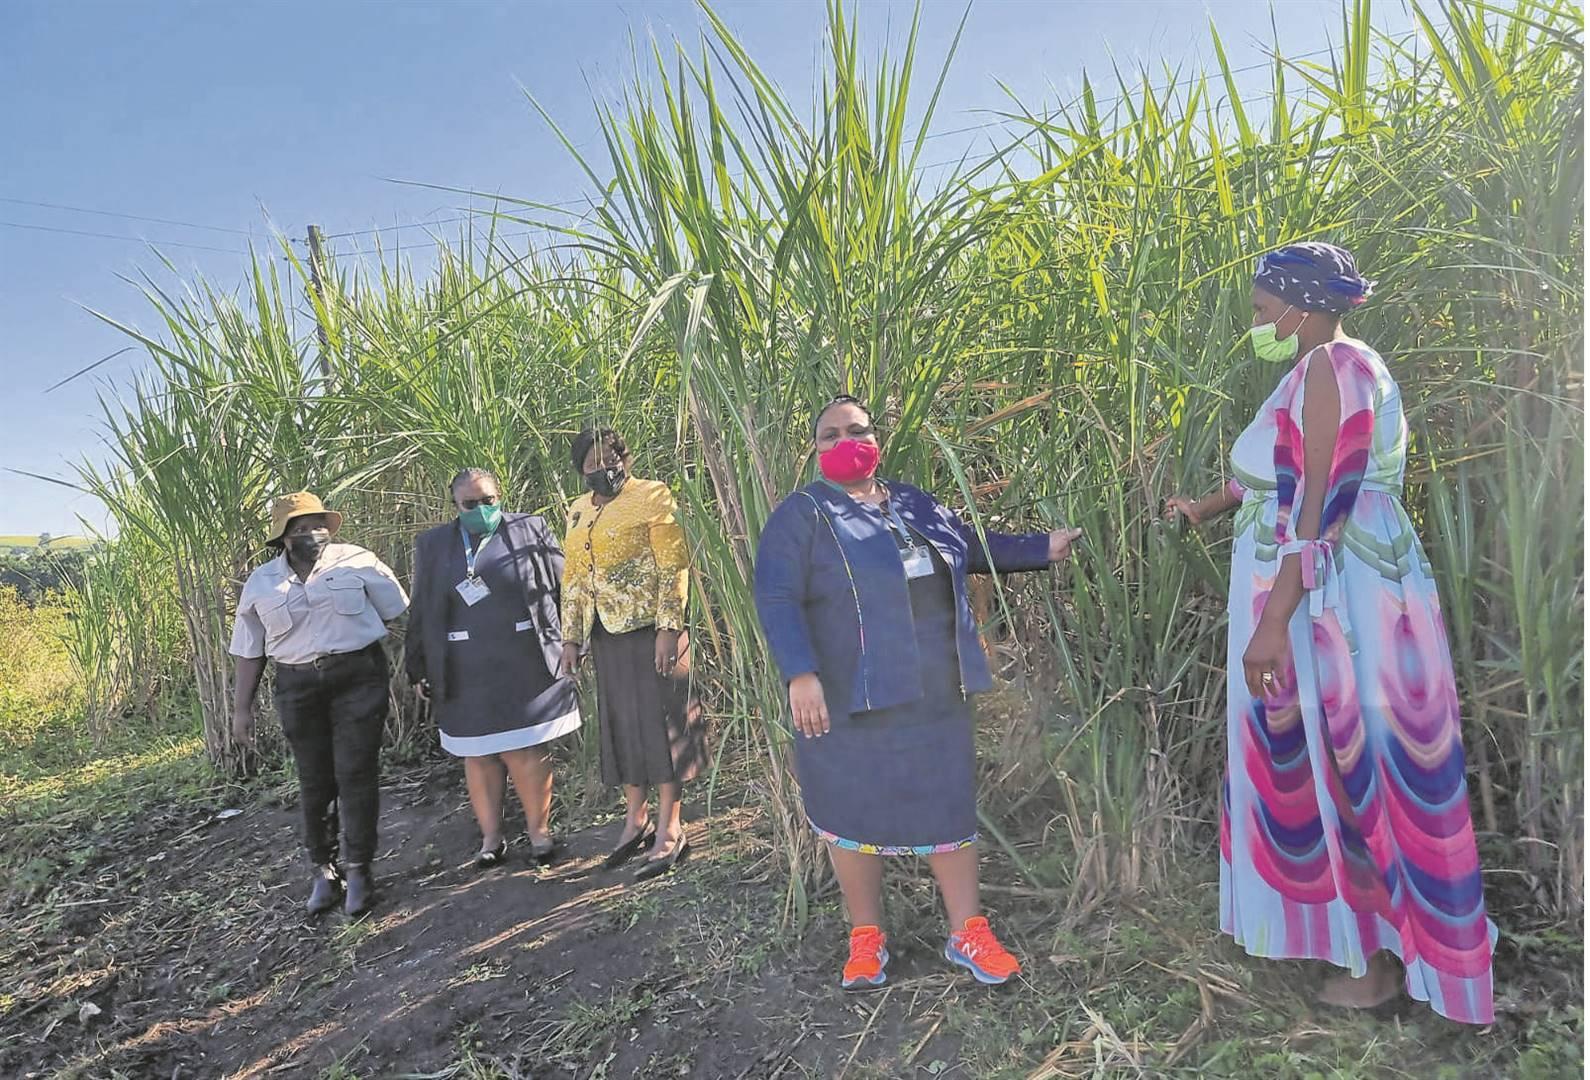 FROM LEFT: Small-scale sugarcane farmer Mbali Shozi, MD of Illovu SA MamongaeMahlare; Bongiwe Sithole-Moloi, KZN MEC for Agriculture and Rural Development; Minister of Agriculture, Land and Rural Development, Thoko Didiza; and small-scale sugarcane farmer Nomanesi Ngcobo.